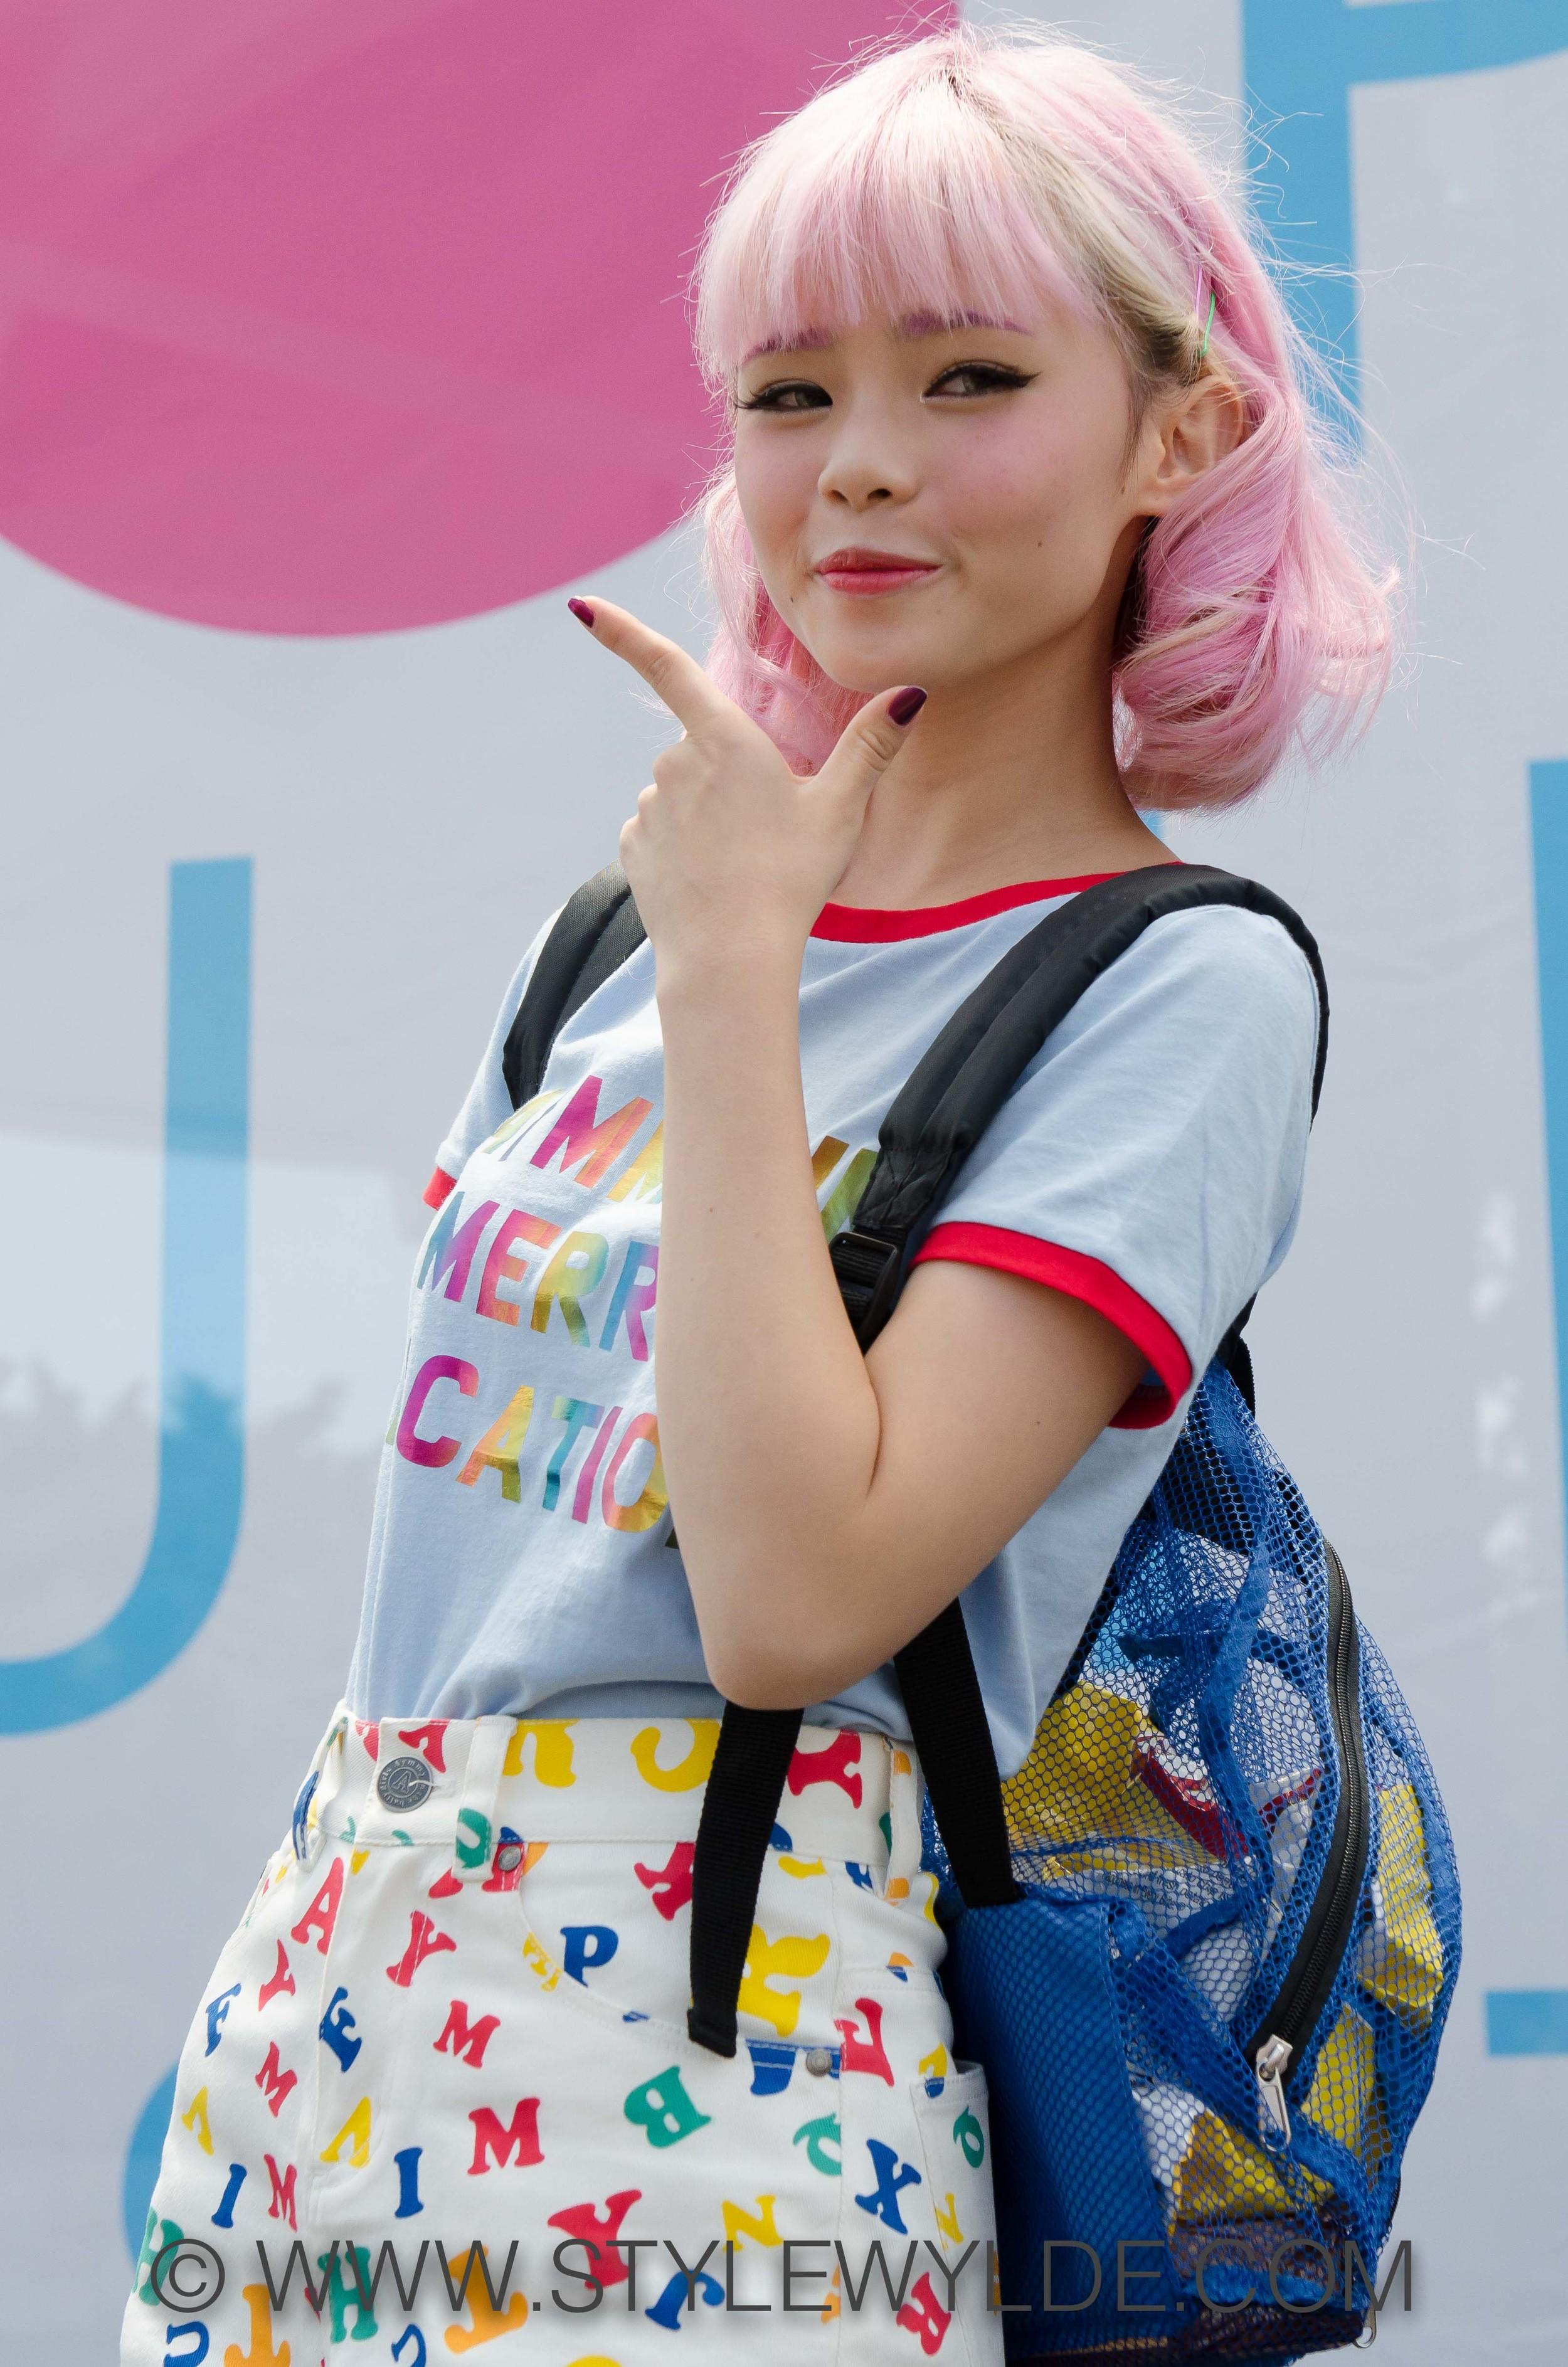 StyleWylde_JPOP14_Day1_CHA (19 of 27).jpg